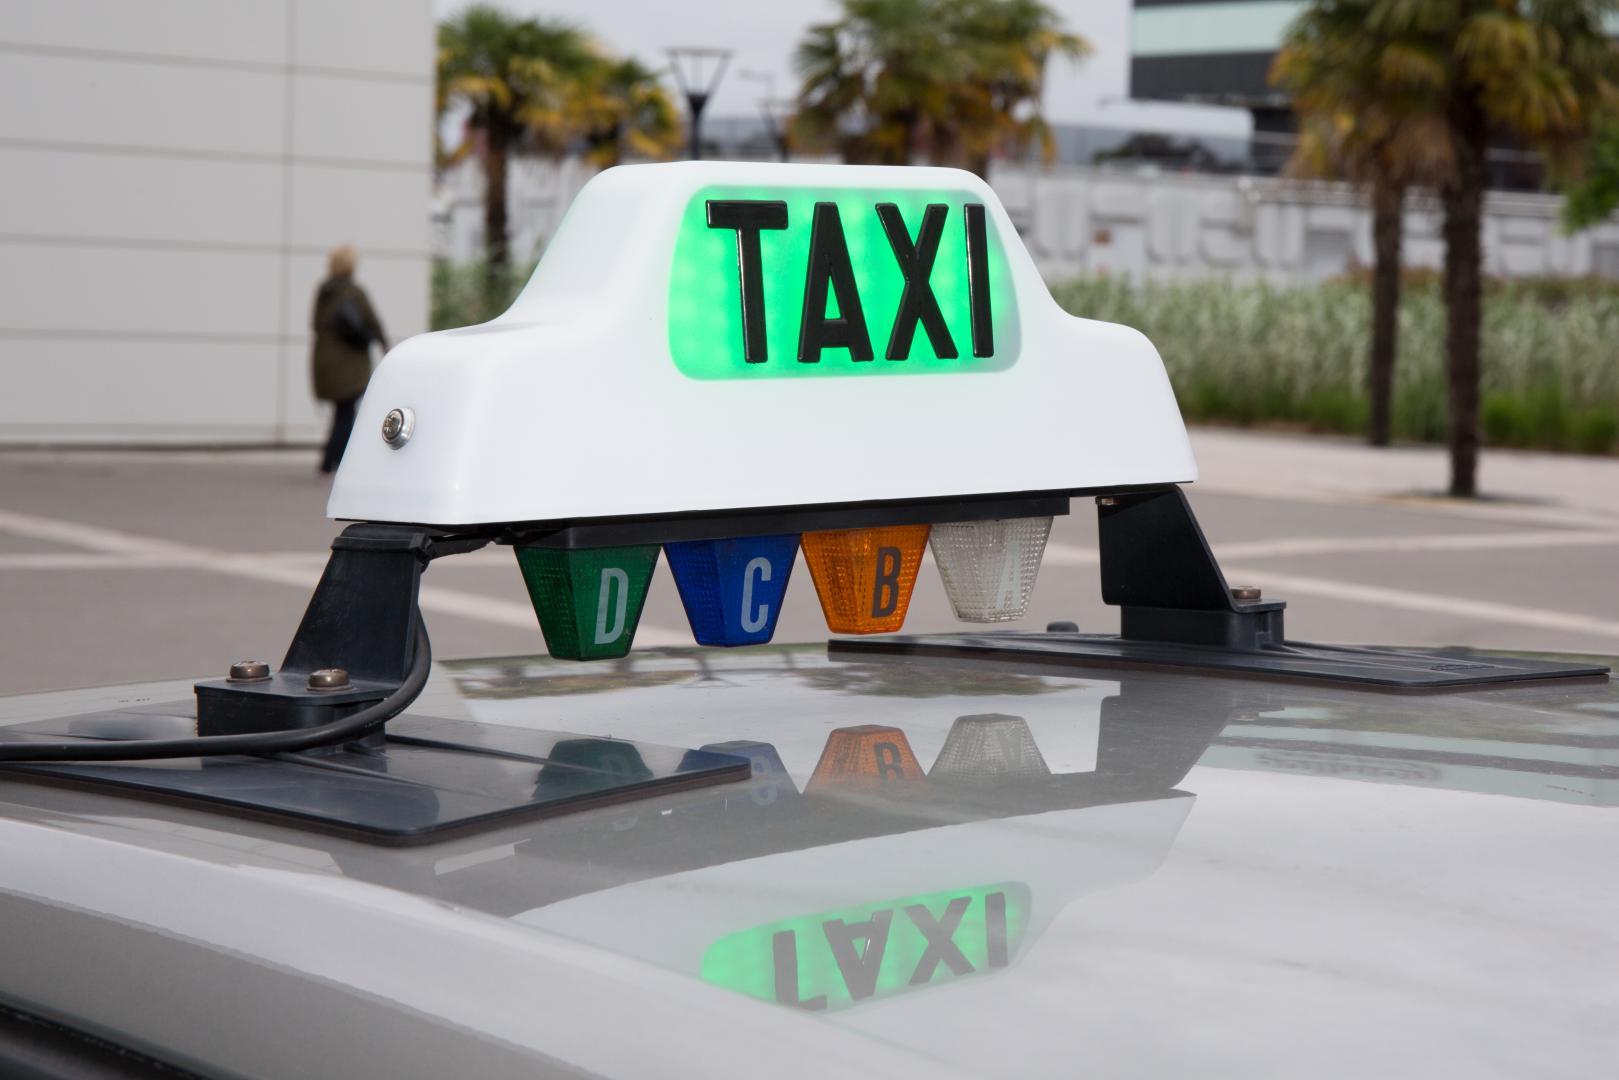 taxi corbie grta les taxis amienois